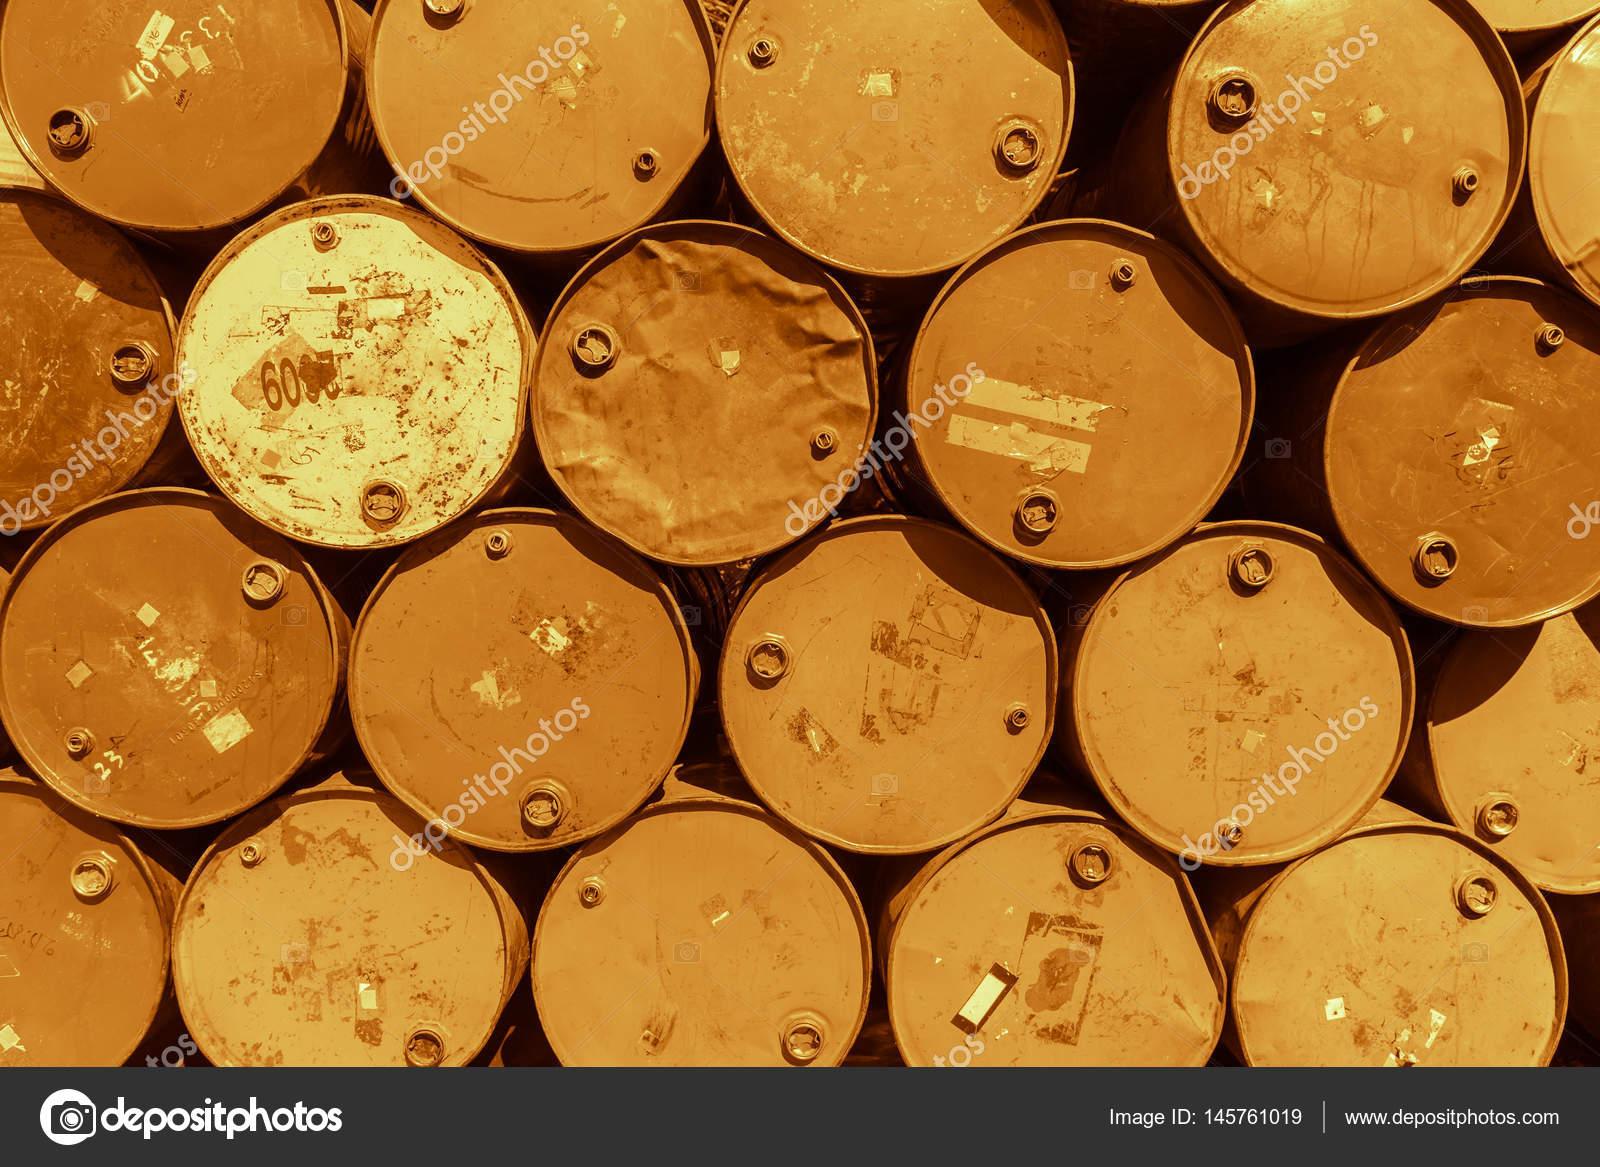 Steel barrel tank or oil fuel toxic chemical barrels old Rusty